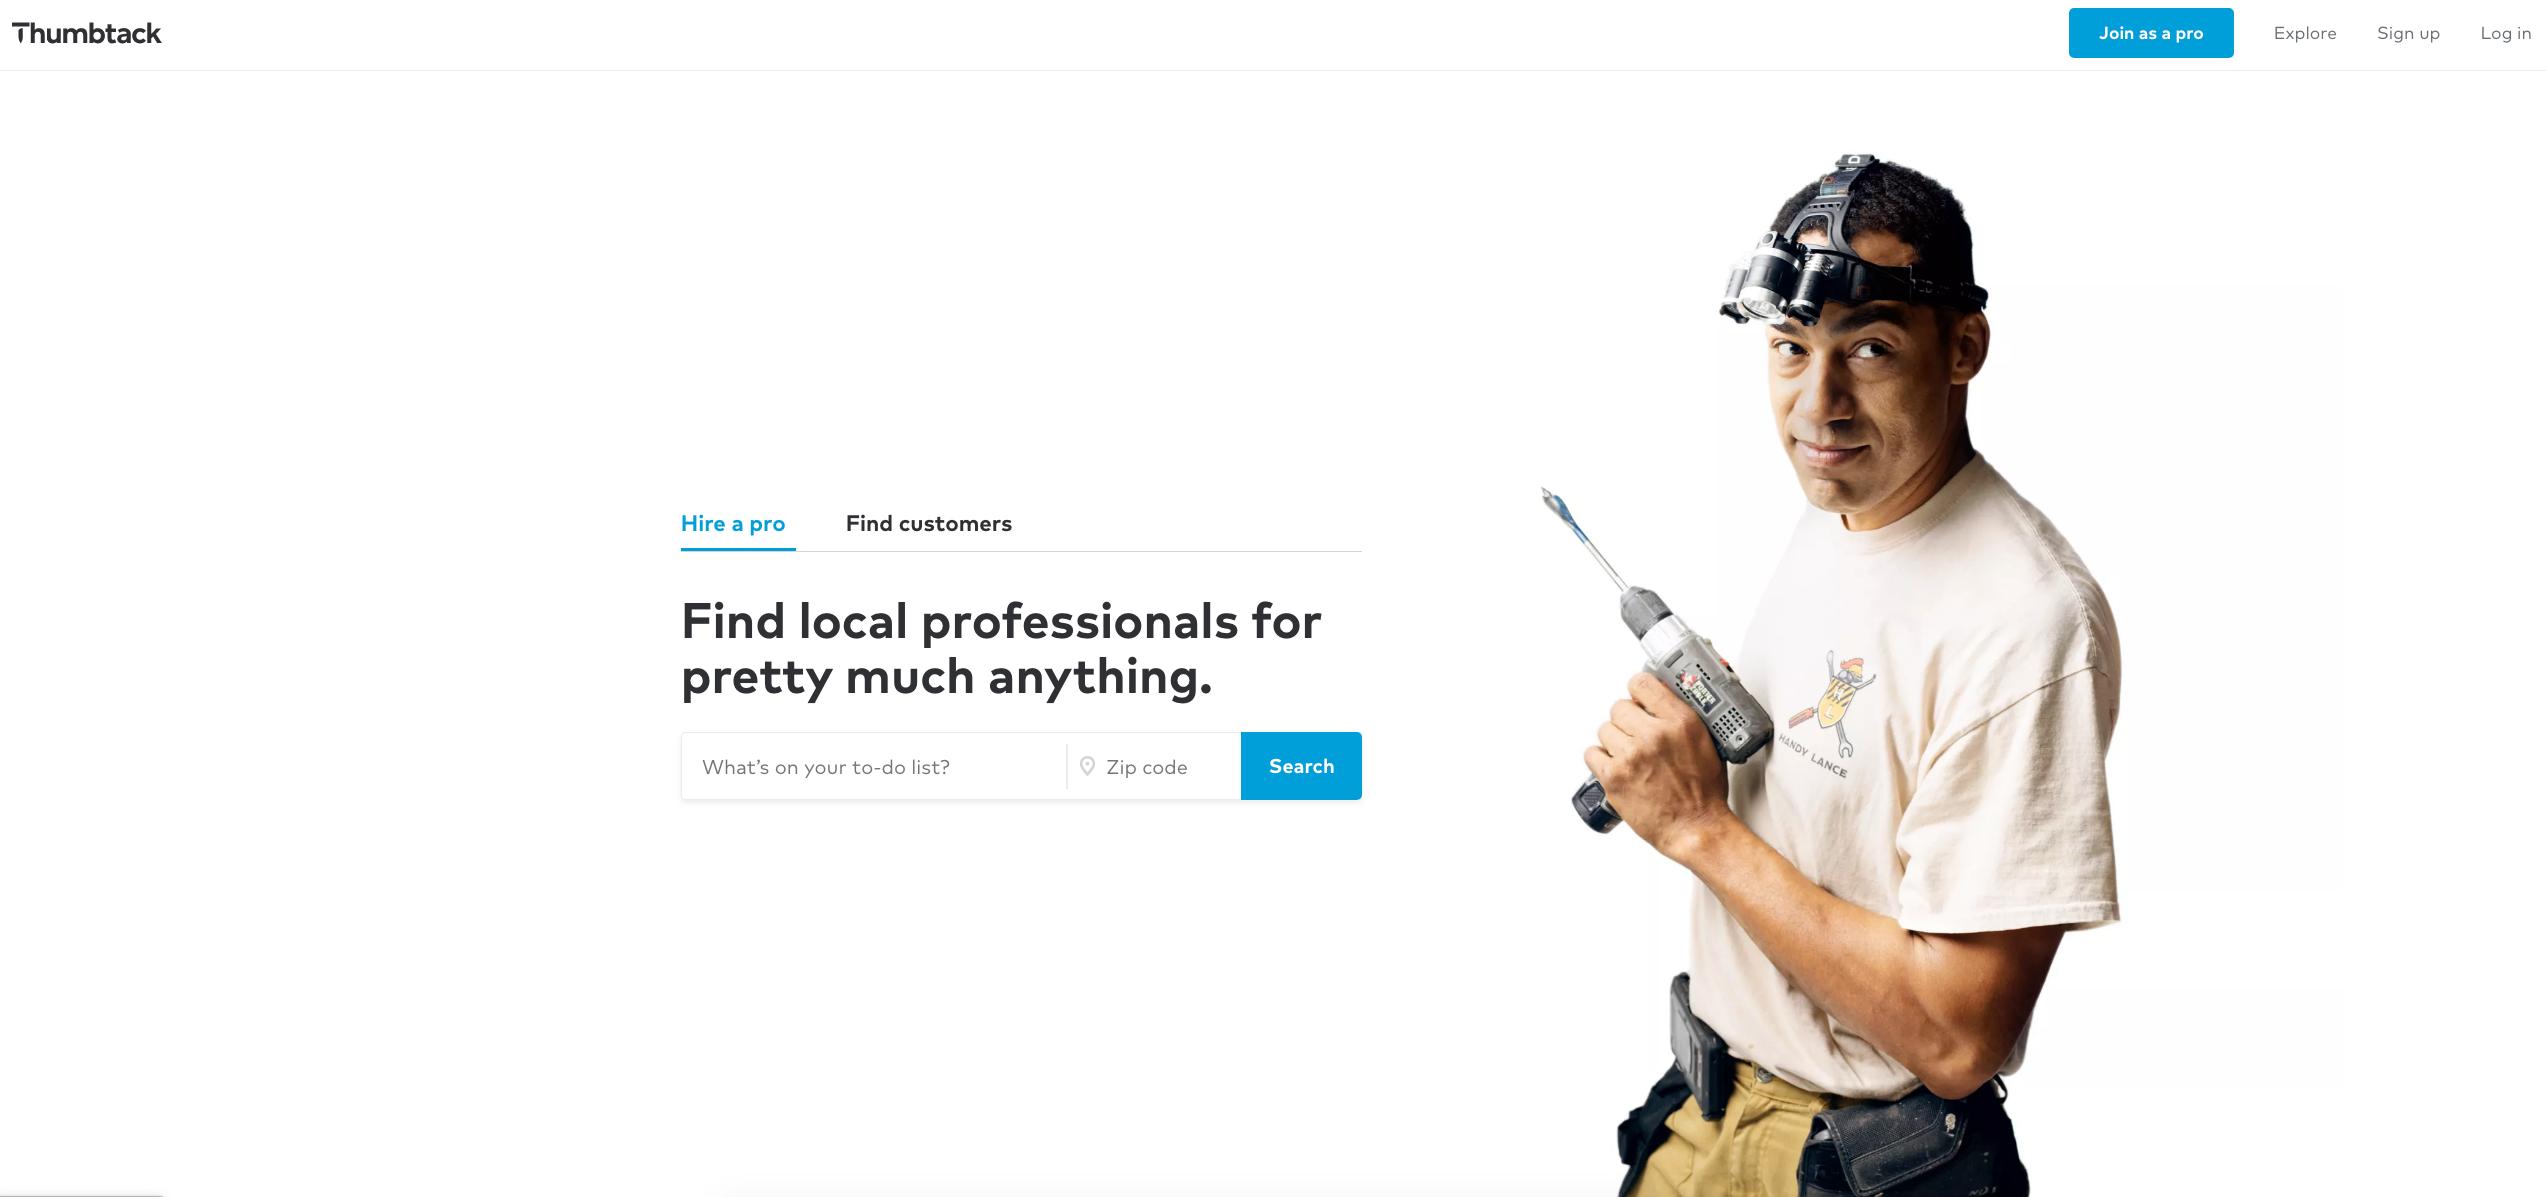 How does online marketplace Thumbtack make money